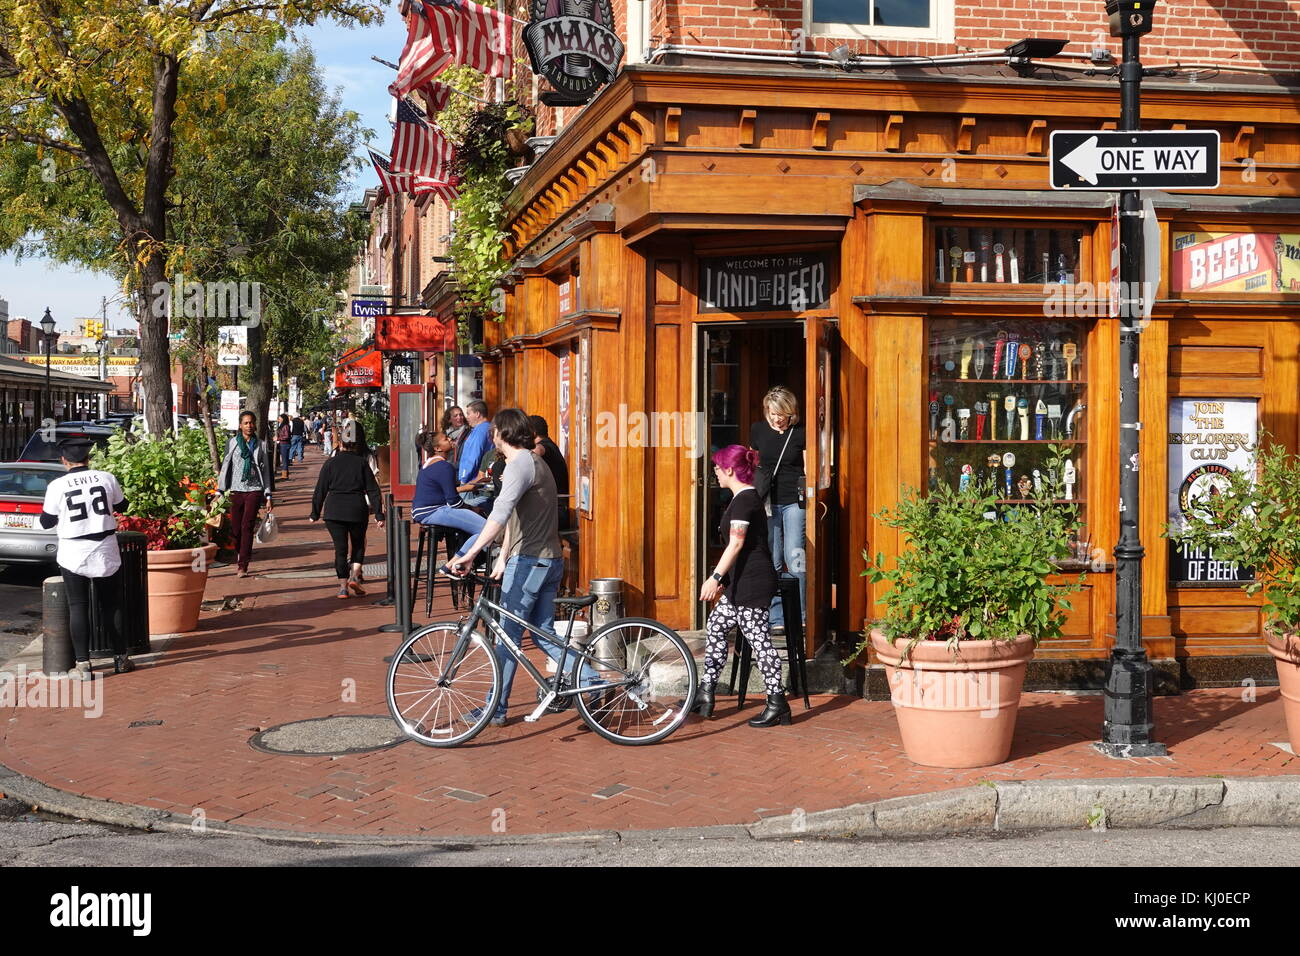 usa-maryland-baltimore-fells-point-maxs-taproom-bar-and-restaurant-KJ0ECP.jpg